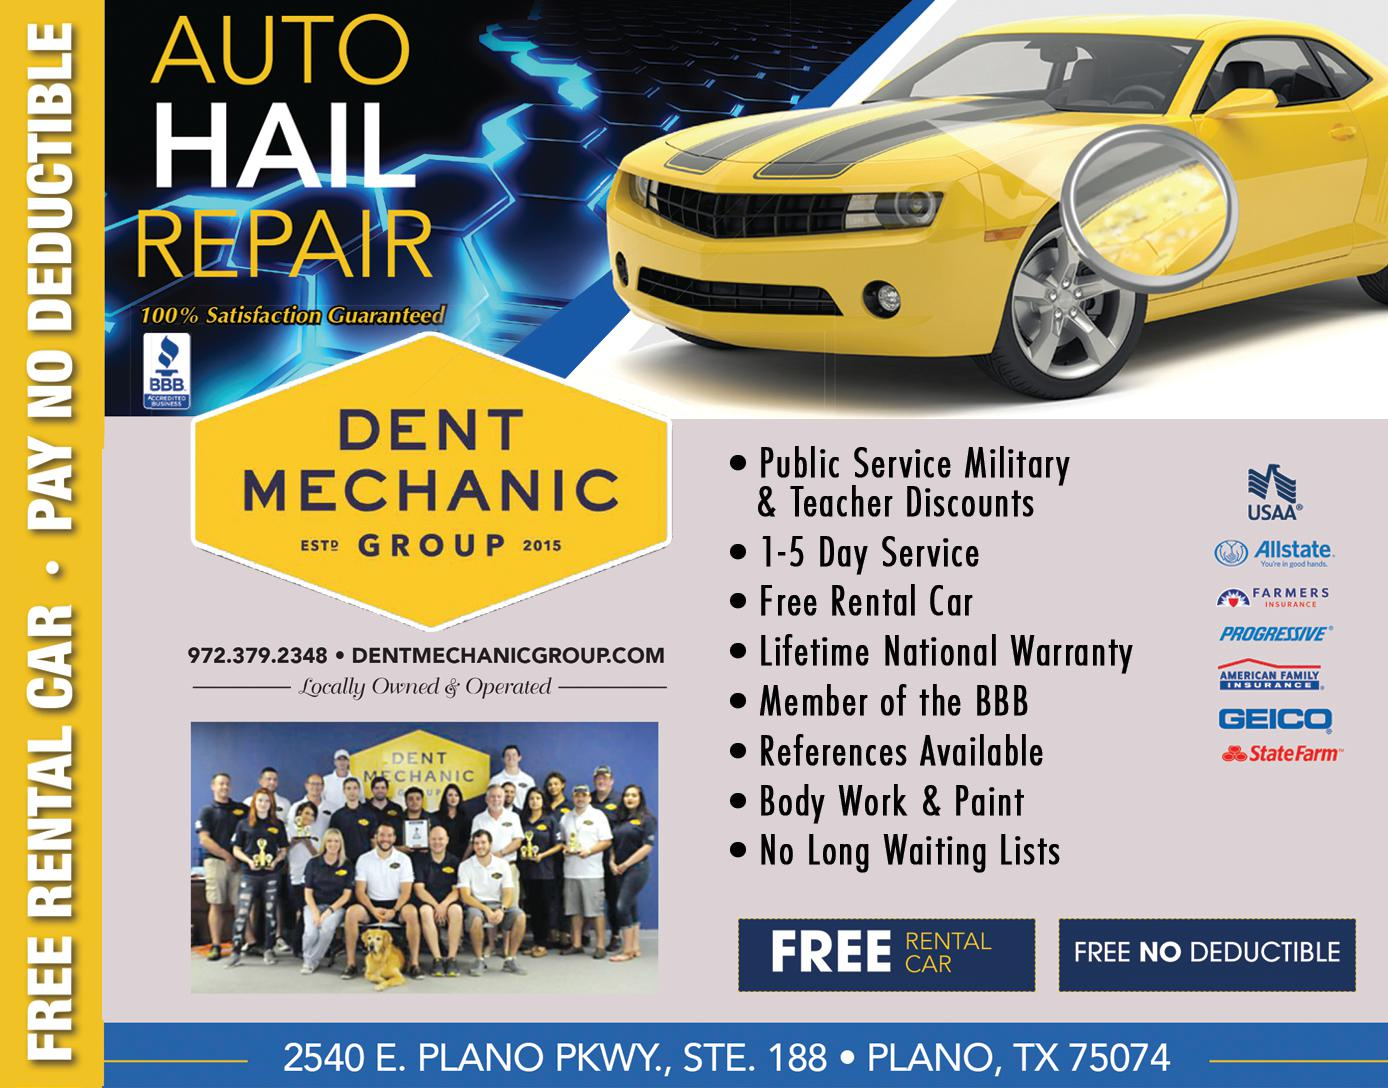 Dent Mechanic Group